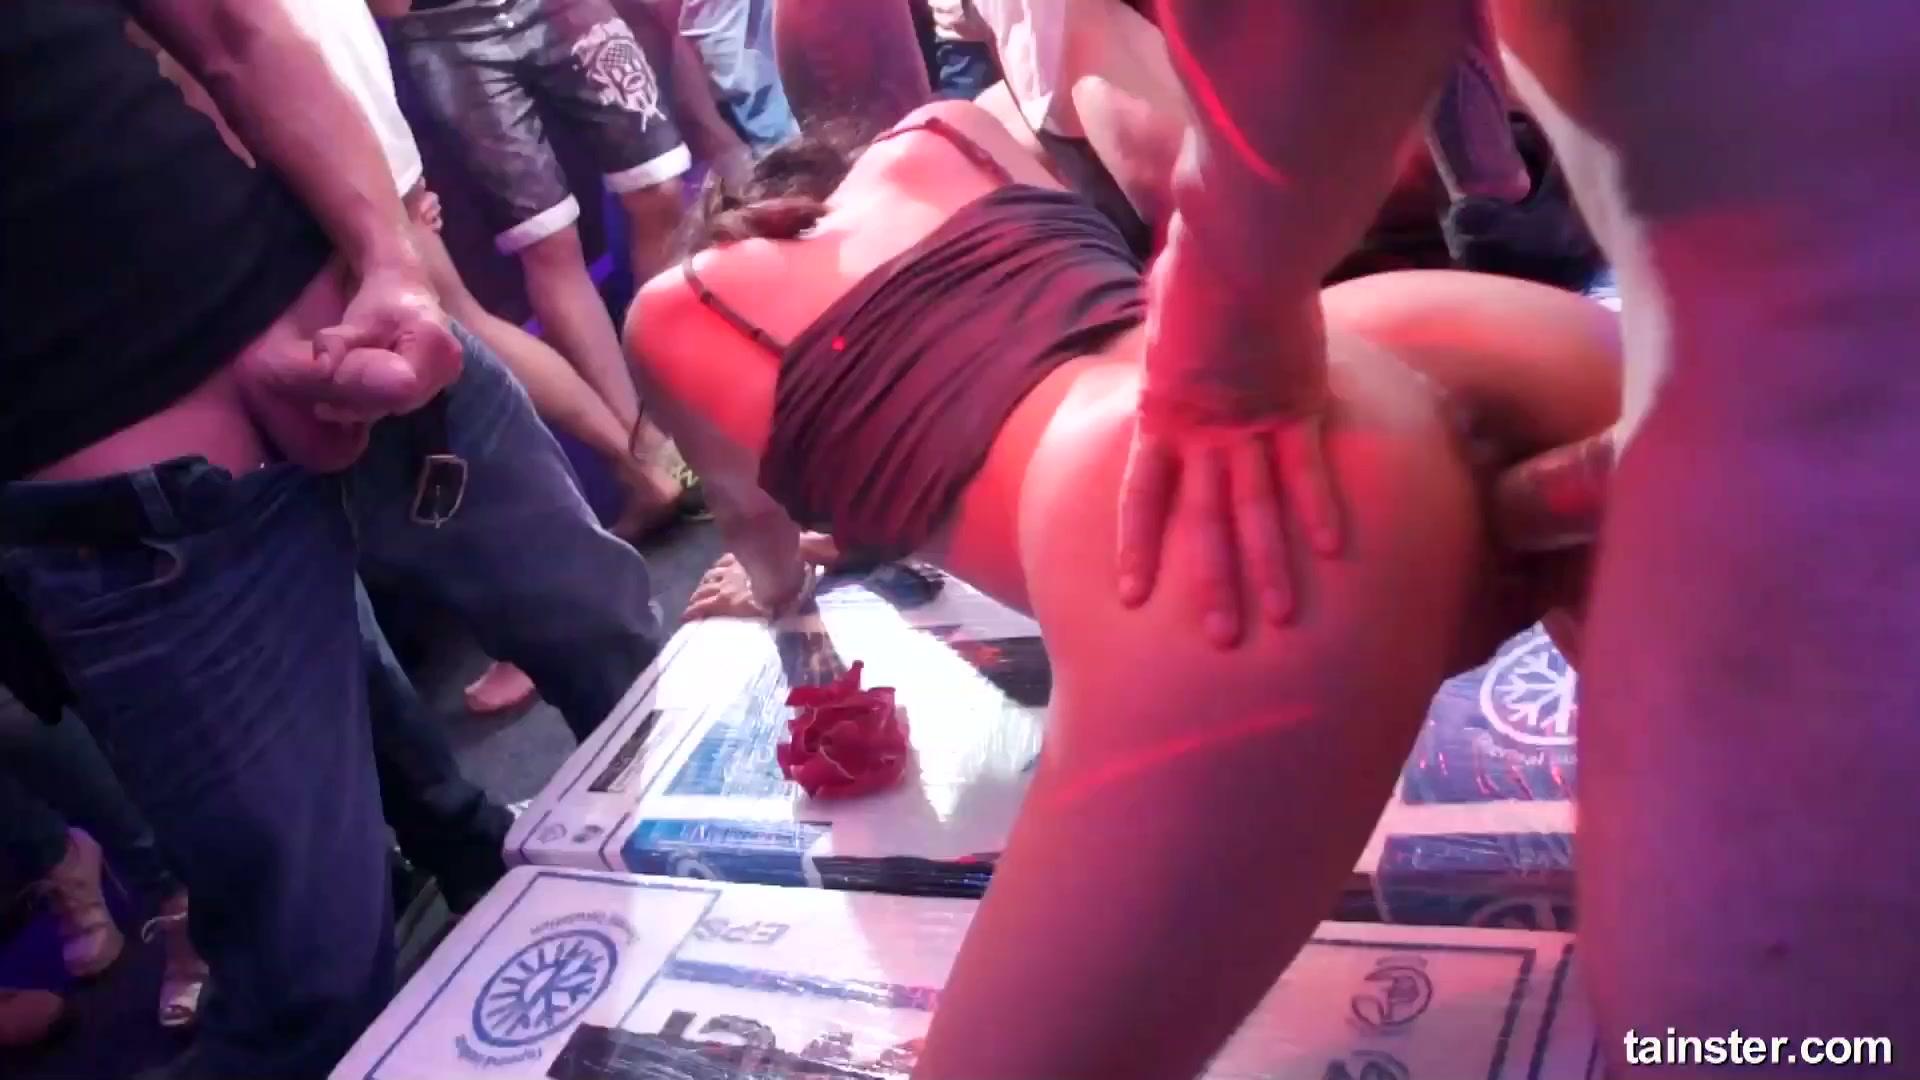 martin ass big madison